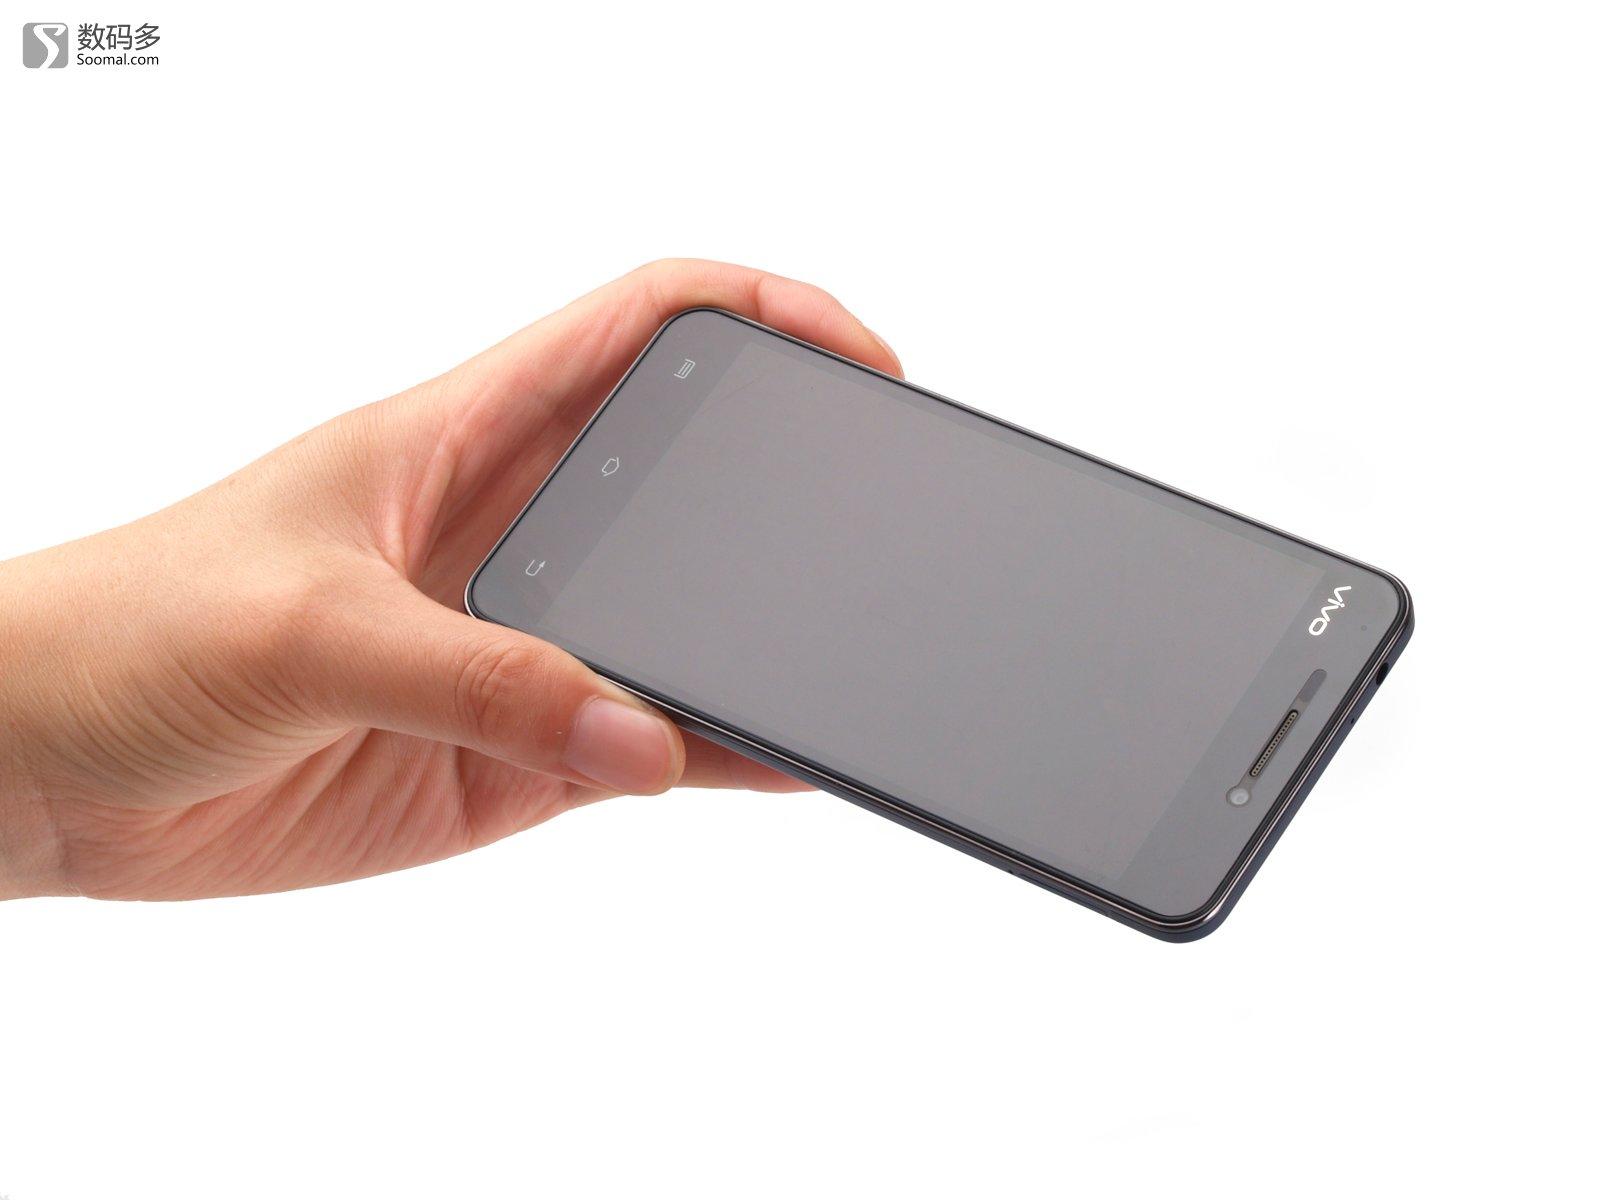 Vivo X3t ƙ�能手机 Soomal 183 ƕ�码多